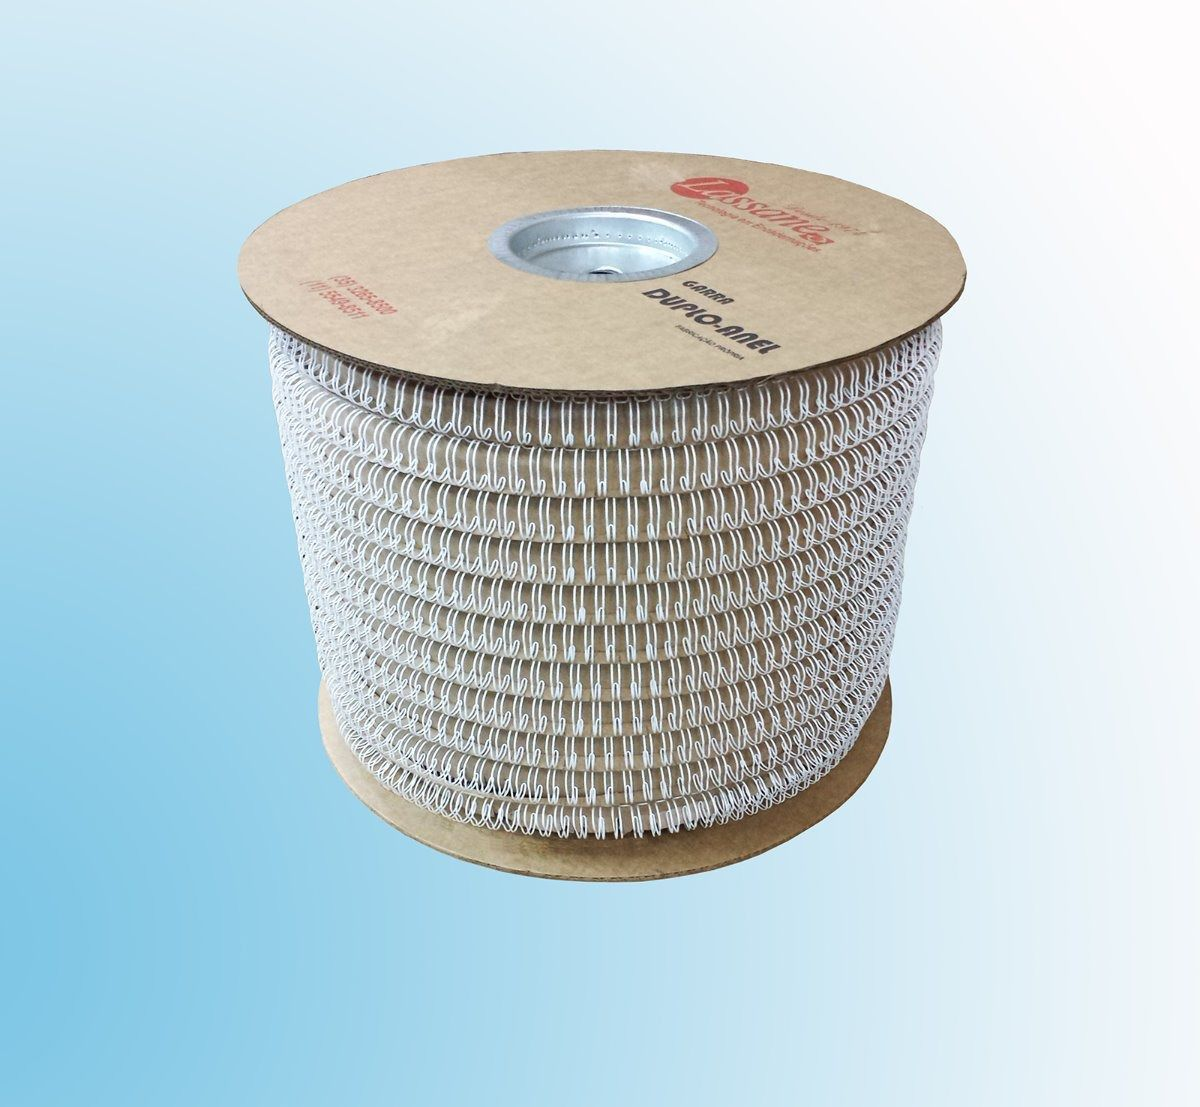 Bobina Espiral Garra Duplo Anel Wire-o 2x1 Diam 1''1/4 270fl